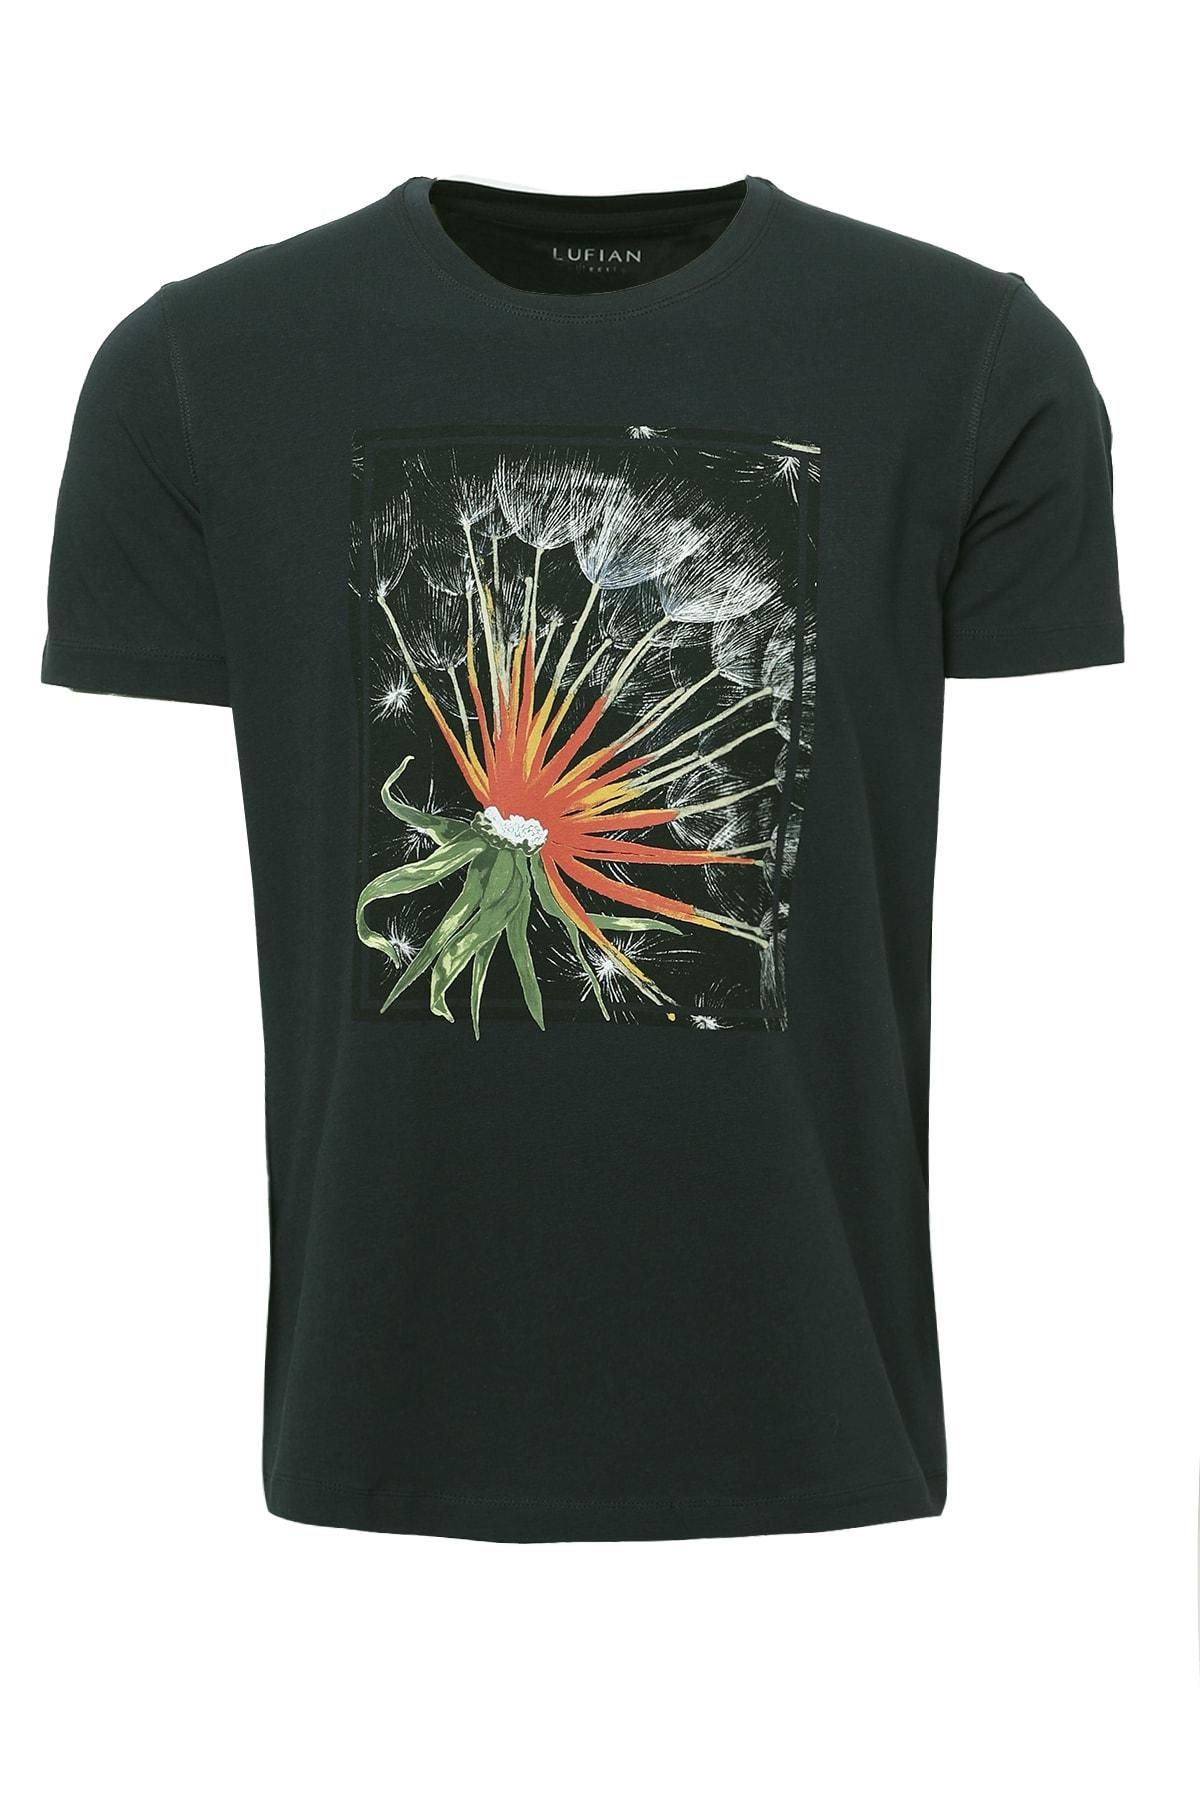 Lufian Felıta Modern Grafik T- Shirt Yeşil